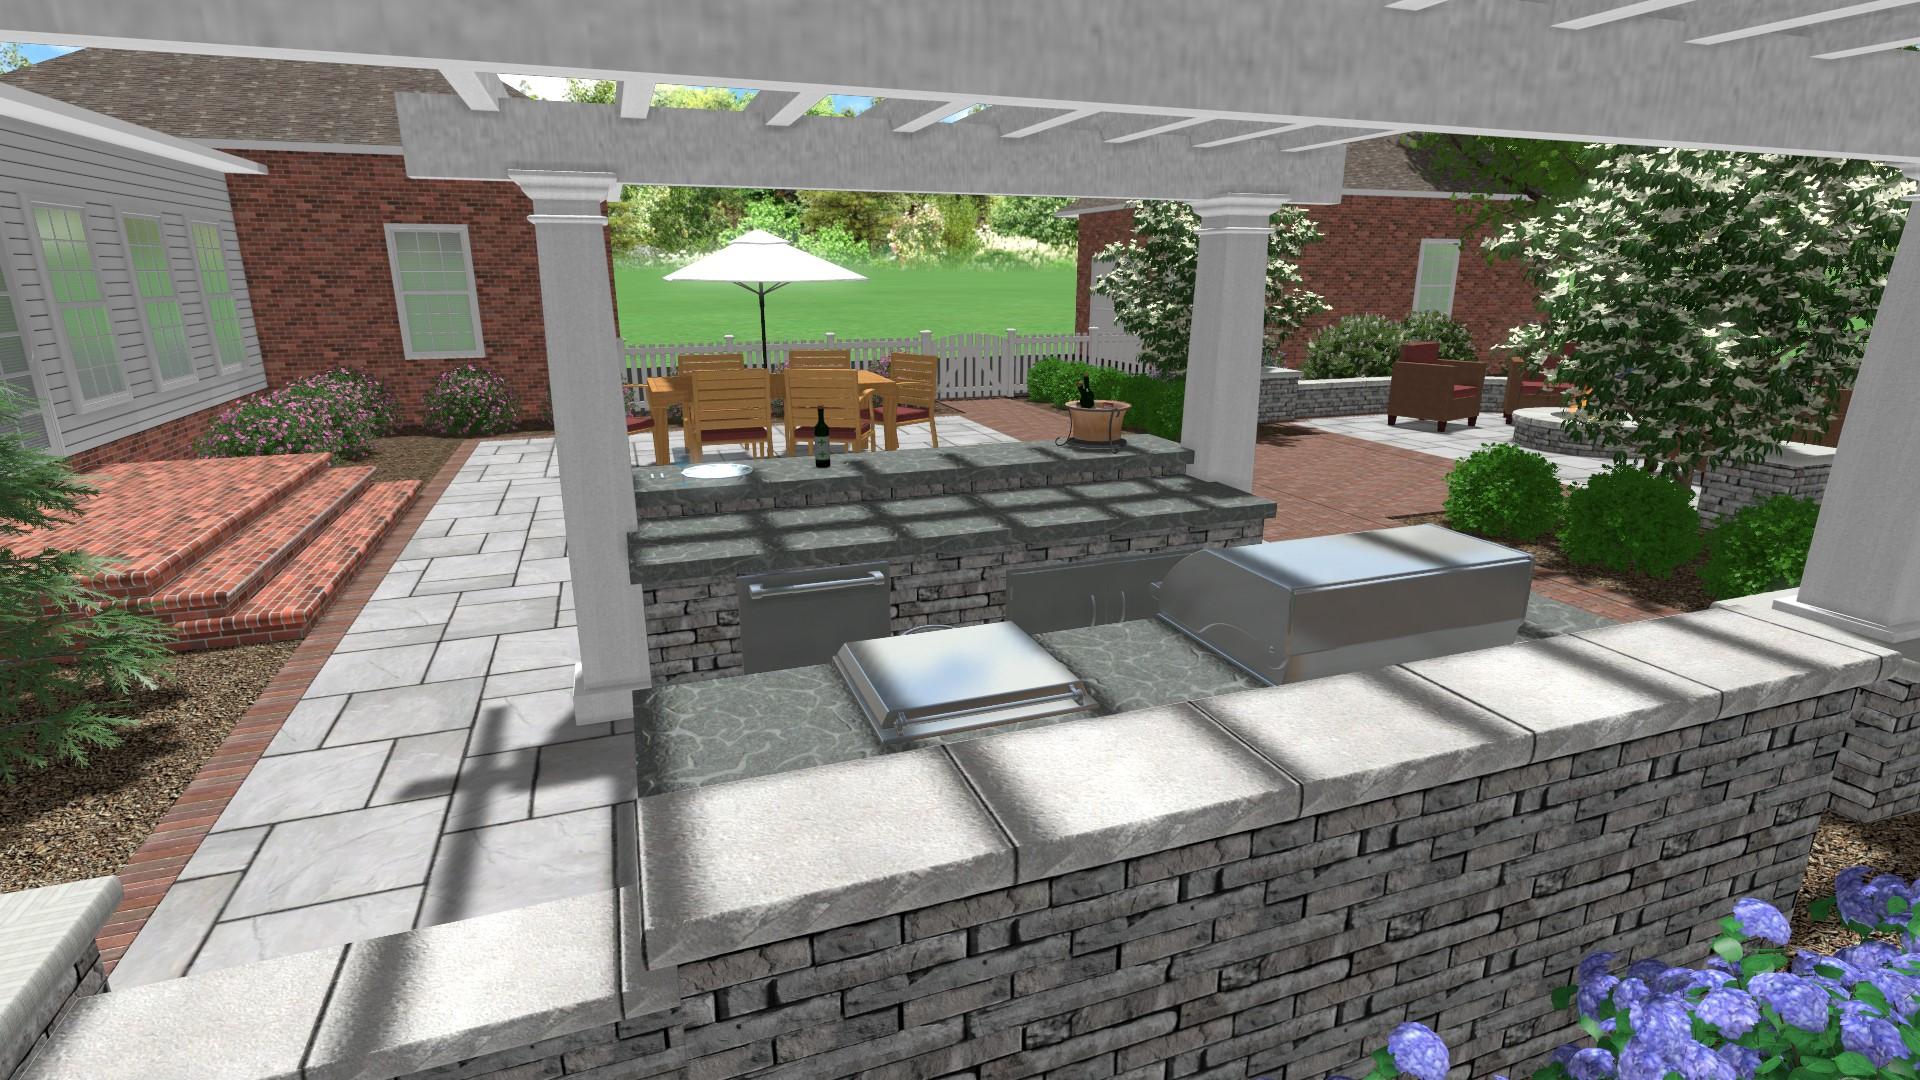 3D Planning